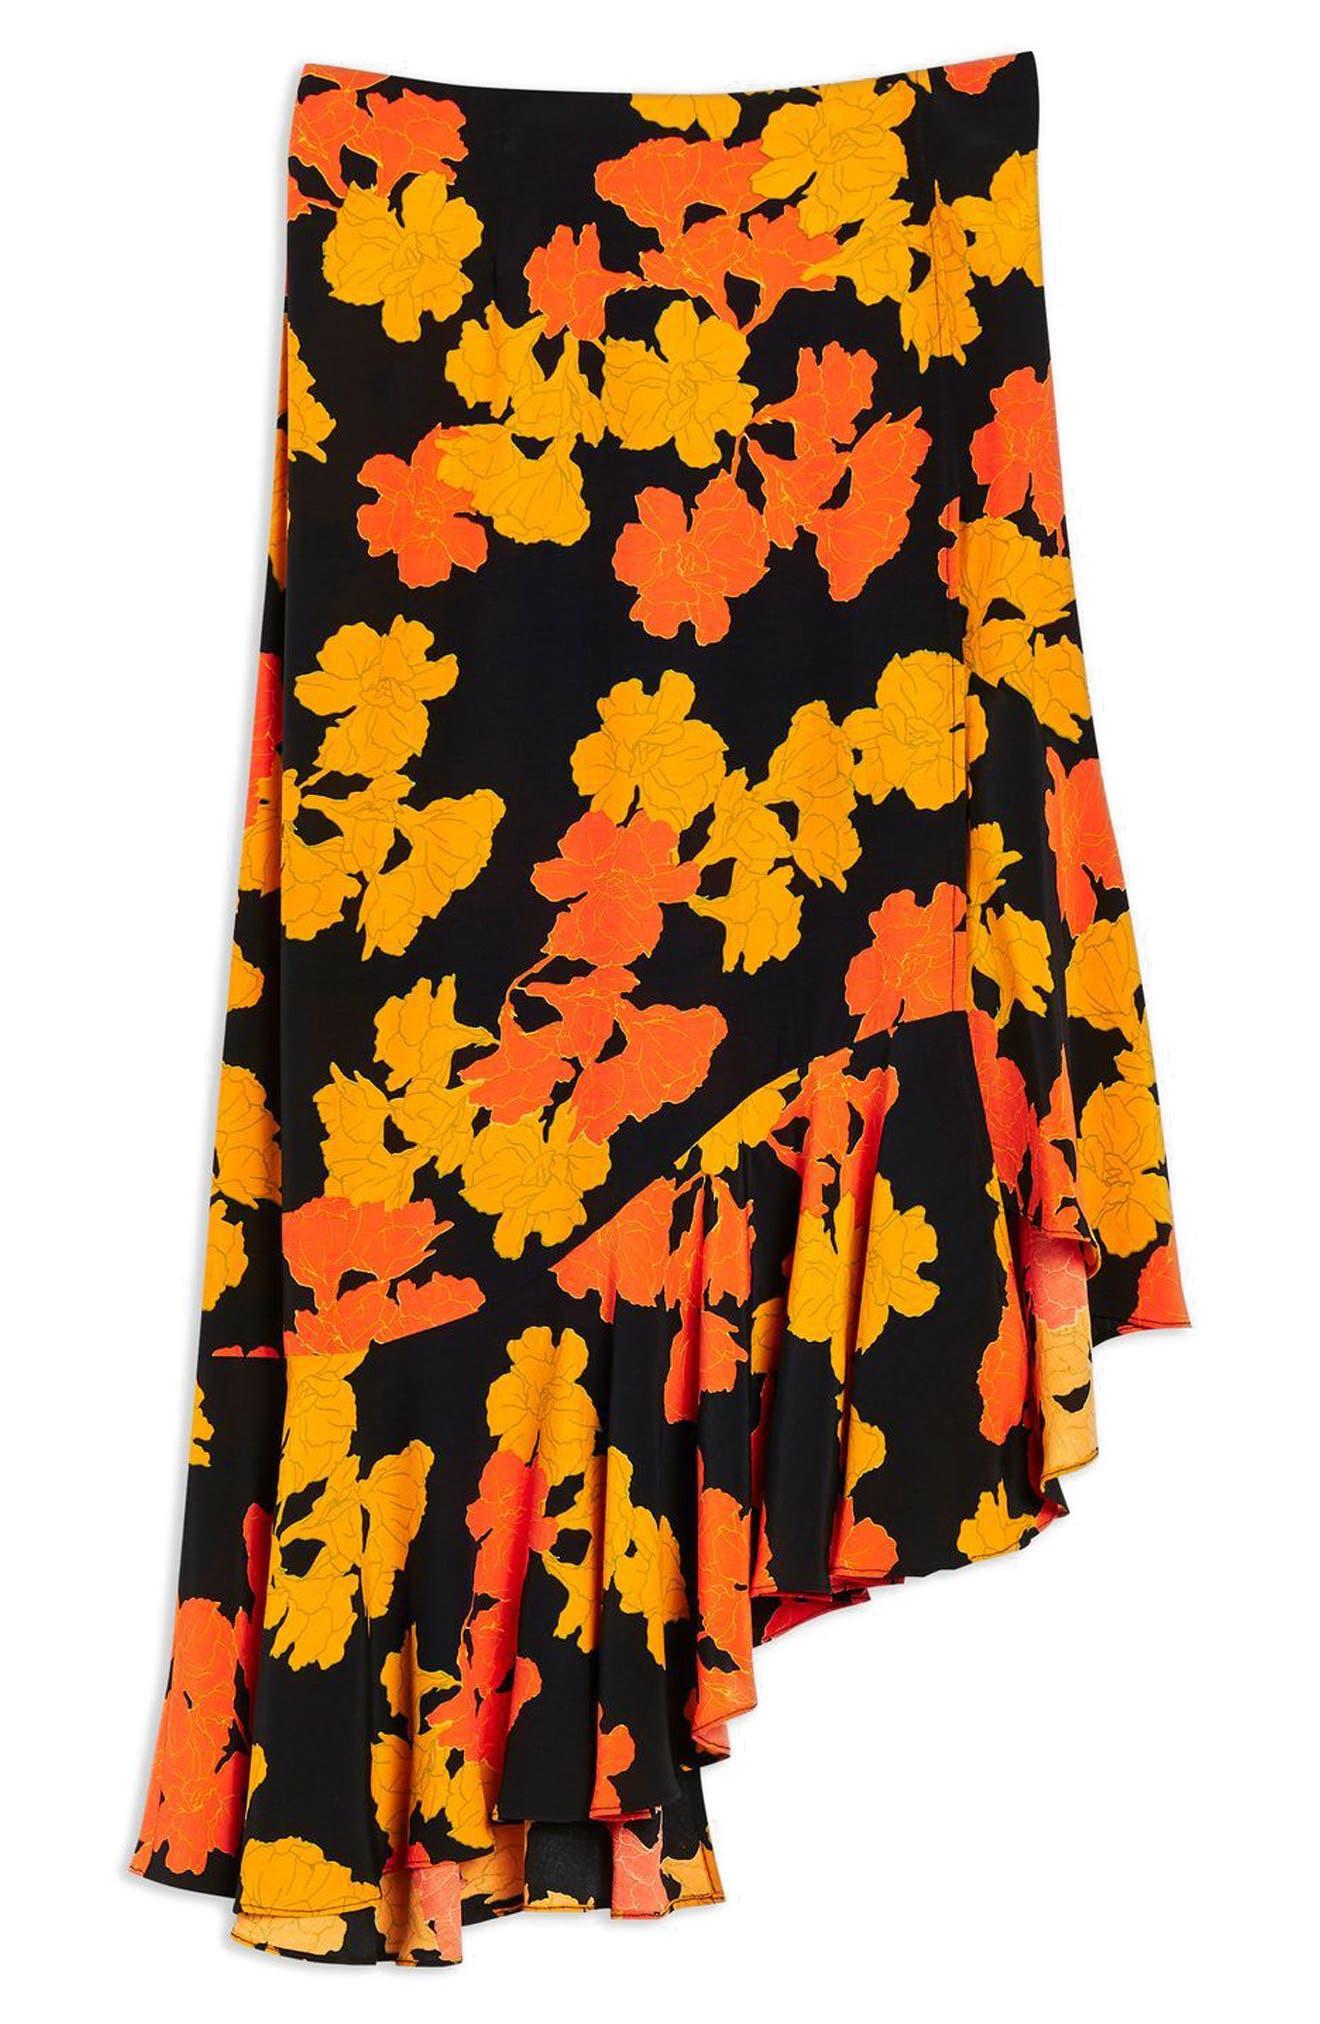 TOPSHOP,                             Printed Midi Skirt,                             Alternate thumbnail 3, color,                             001